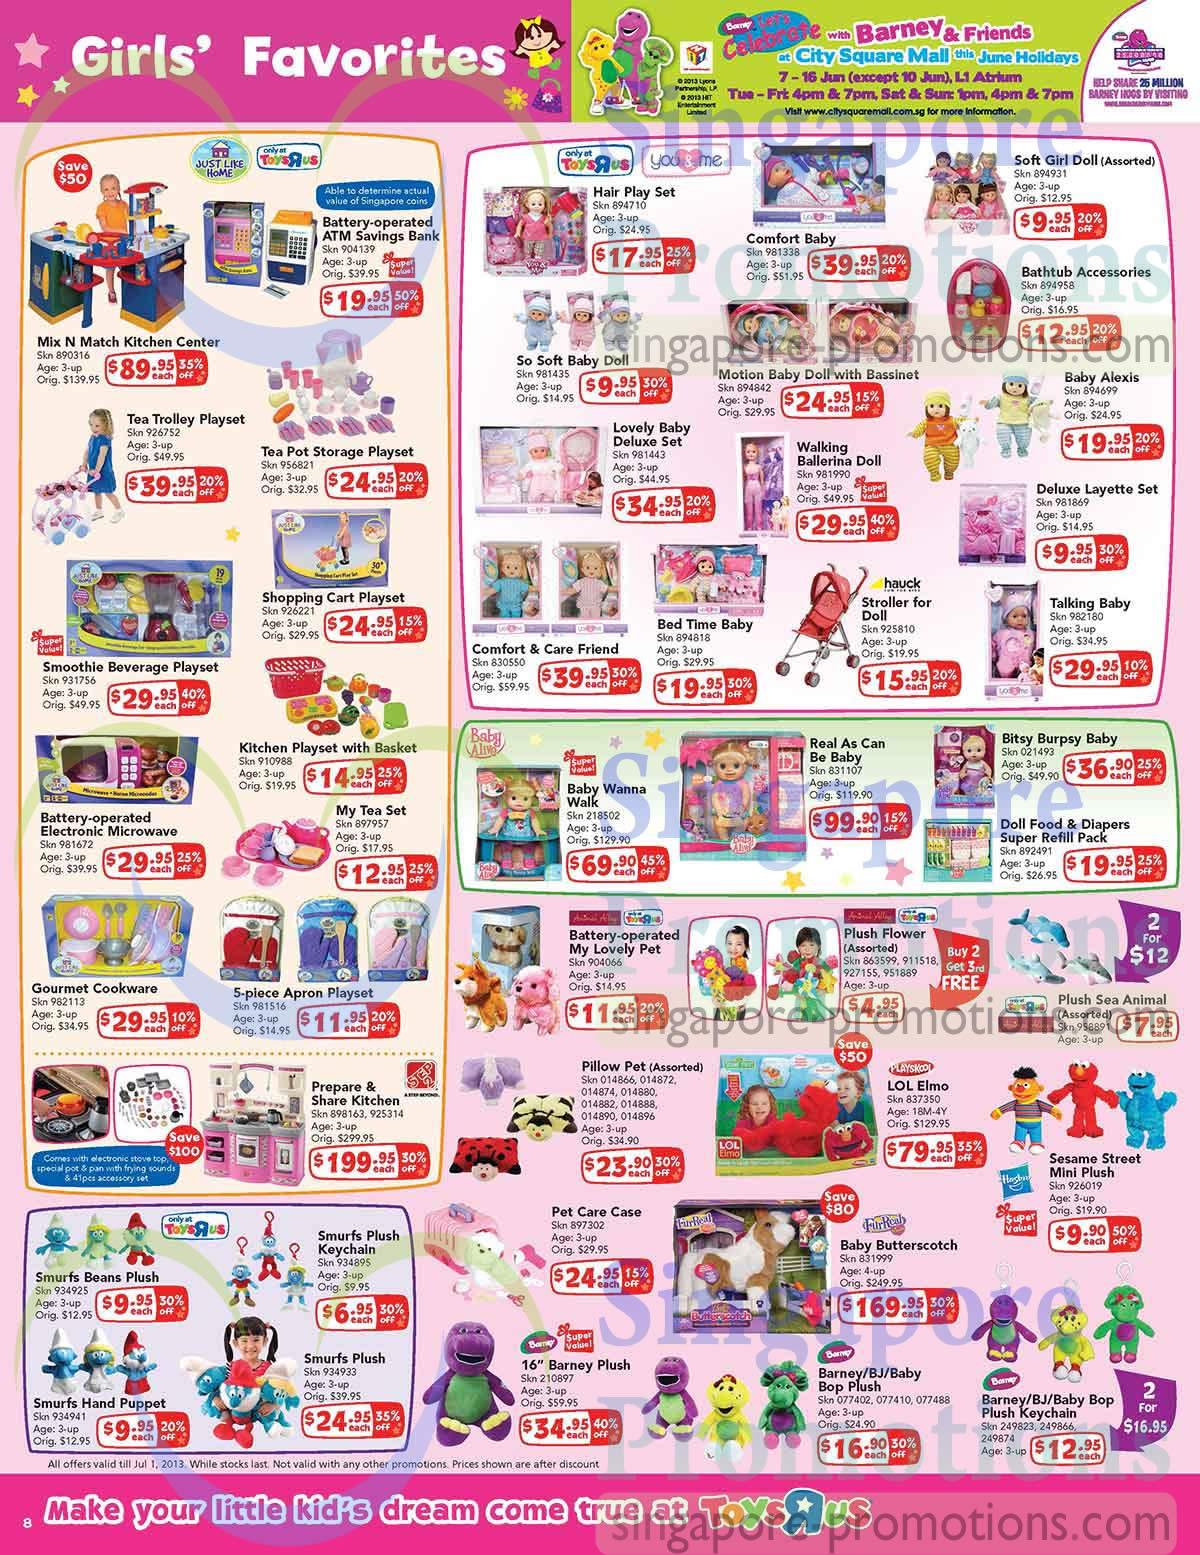 Girls Favourites, Dolls, Playsets, Plush Toys, Barney -2284